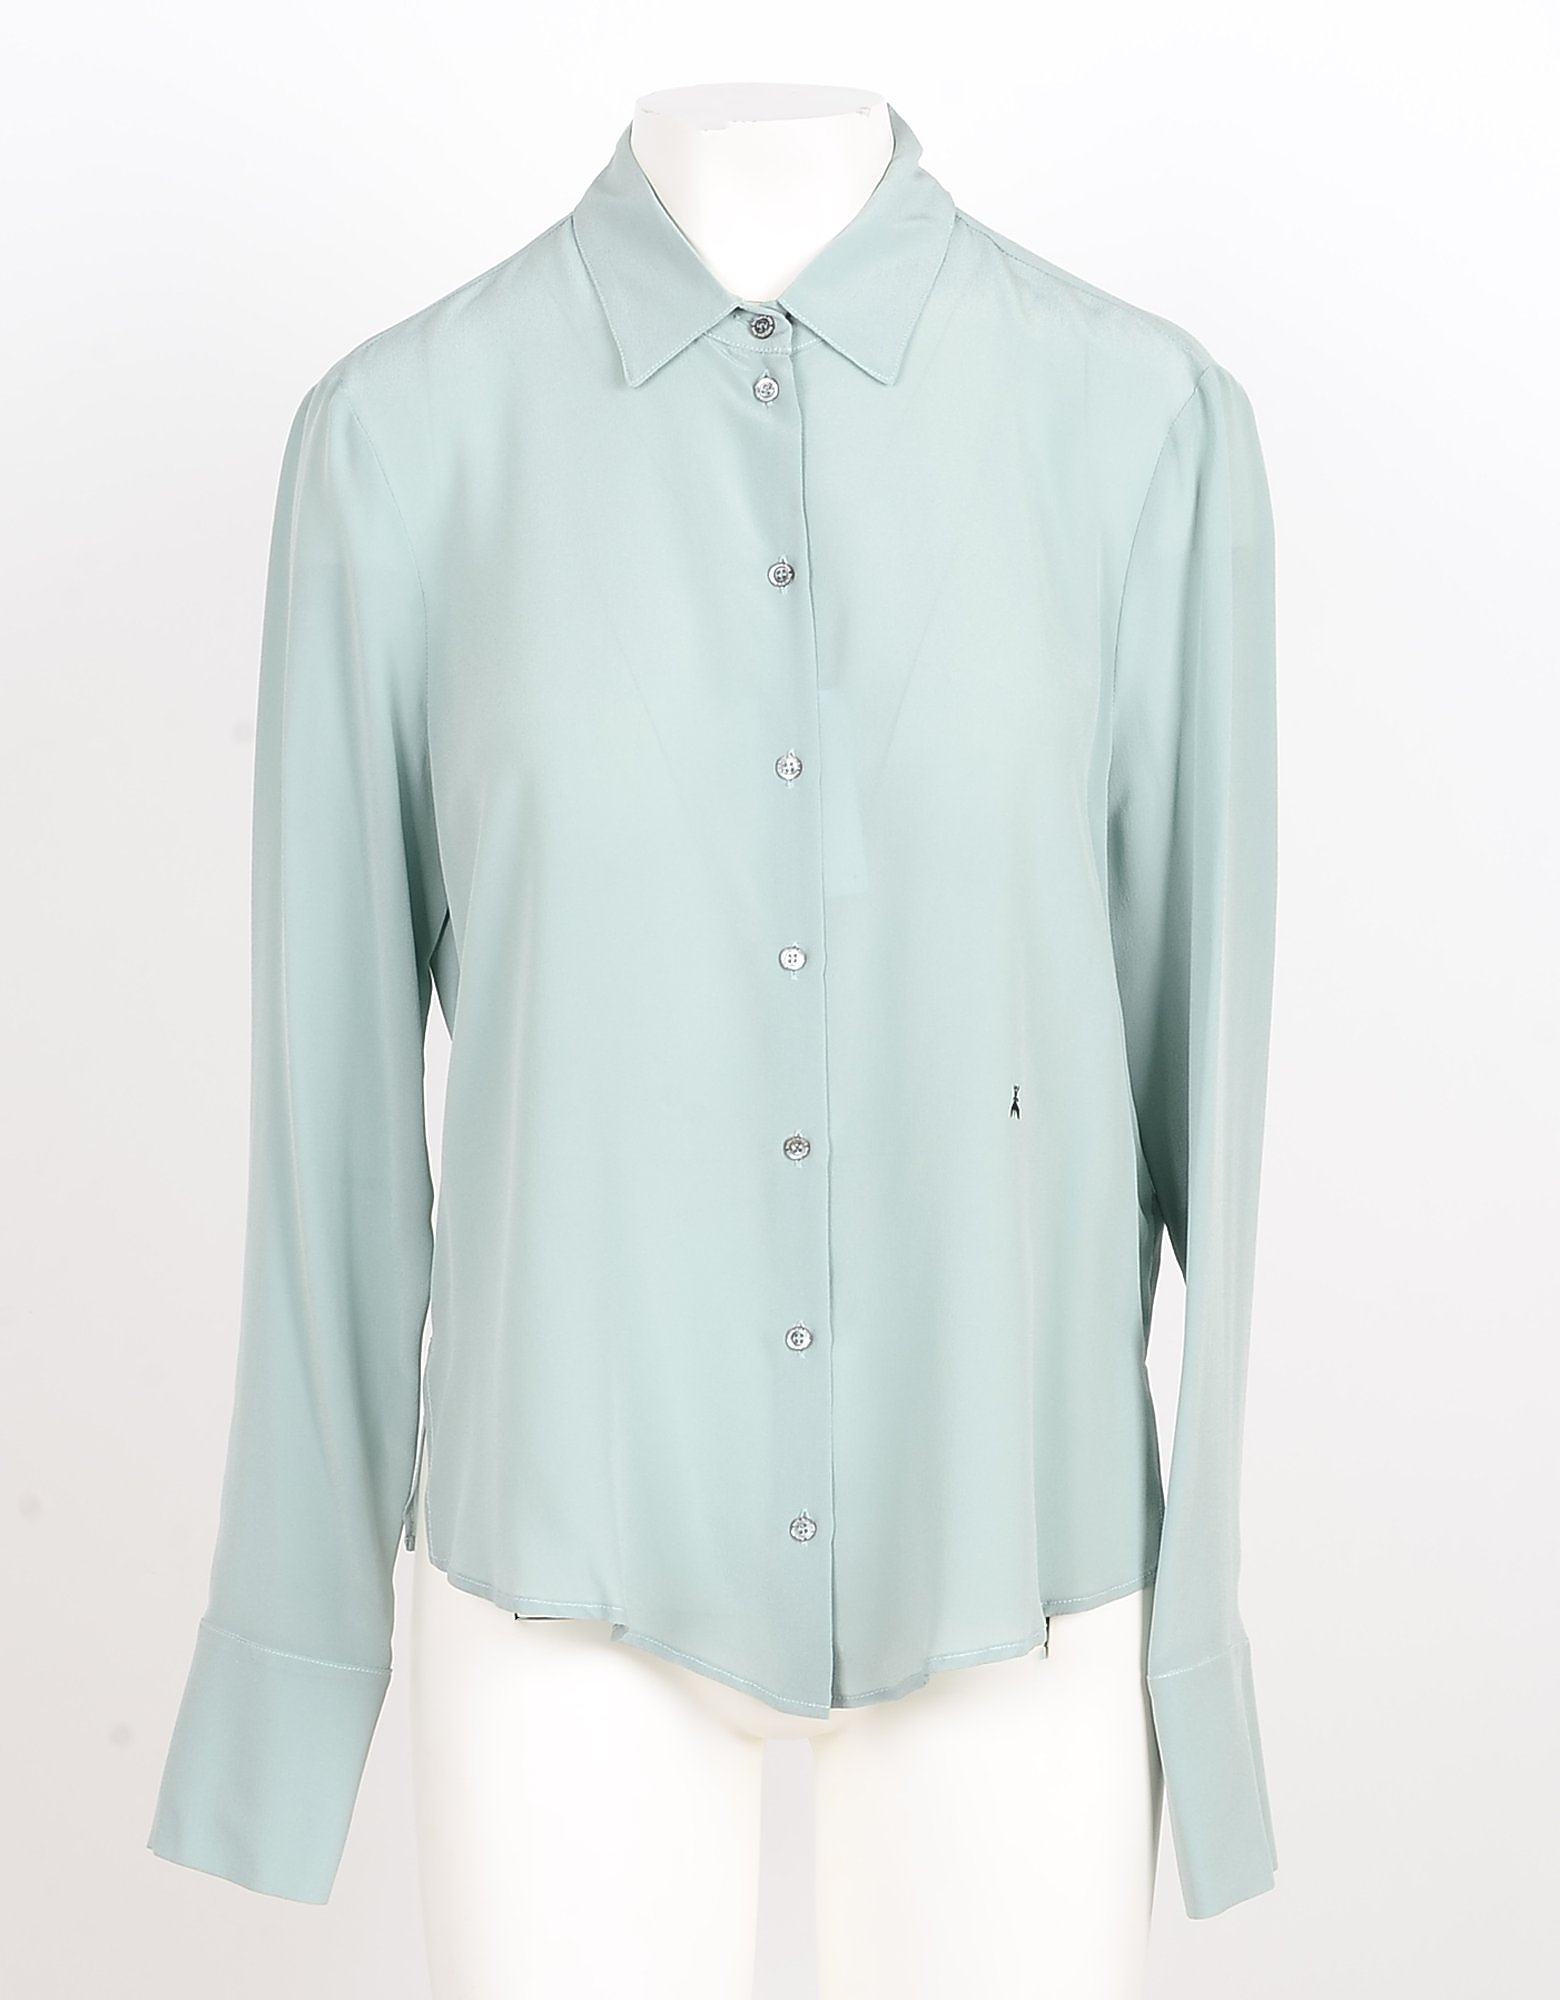 Patrizia Pepe Designer Shirts, Aqua Pure Silk Women's Shirt